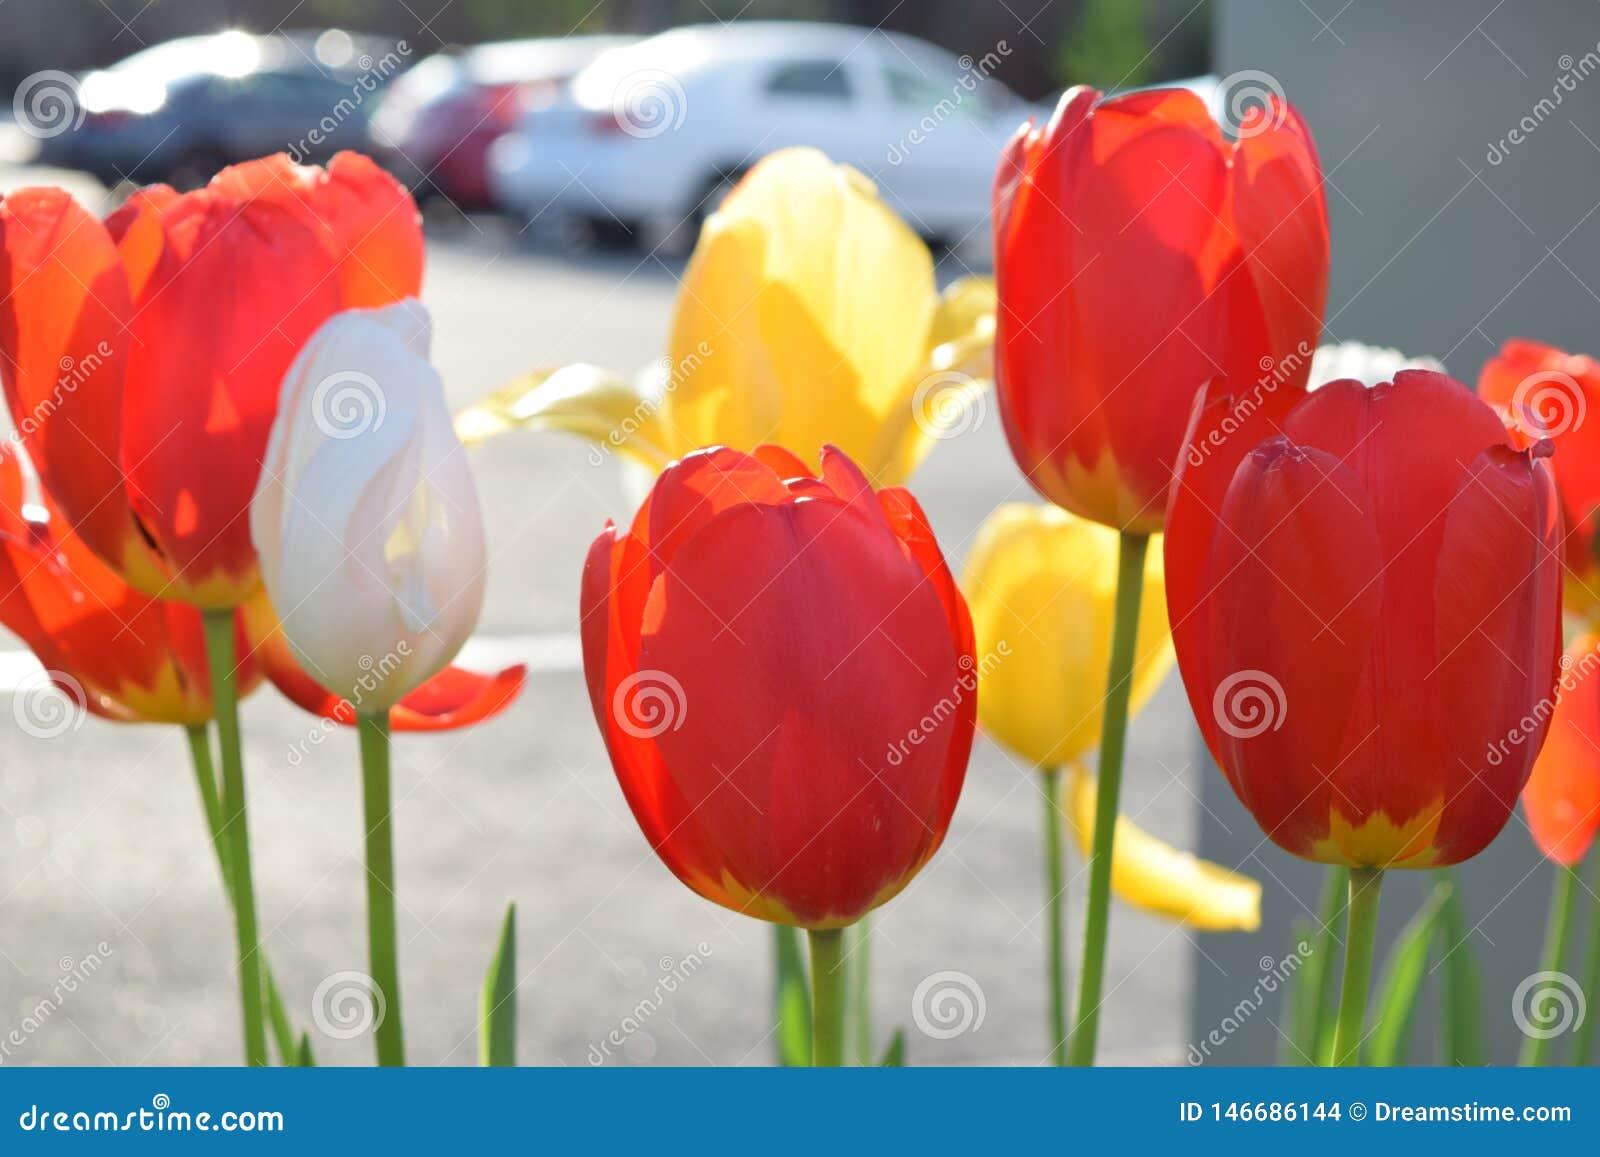 Tulpenbloei in de lente